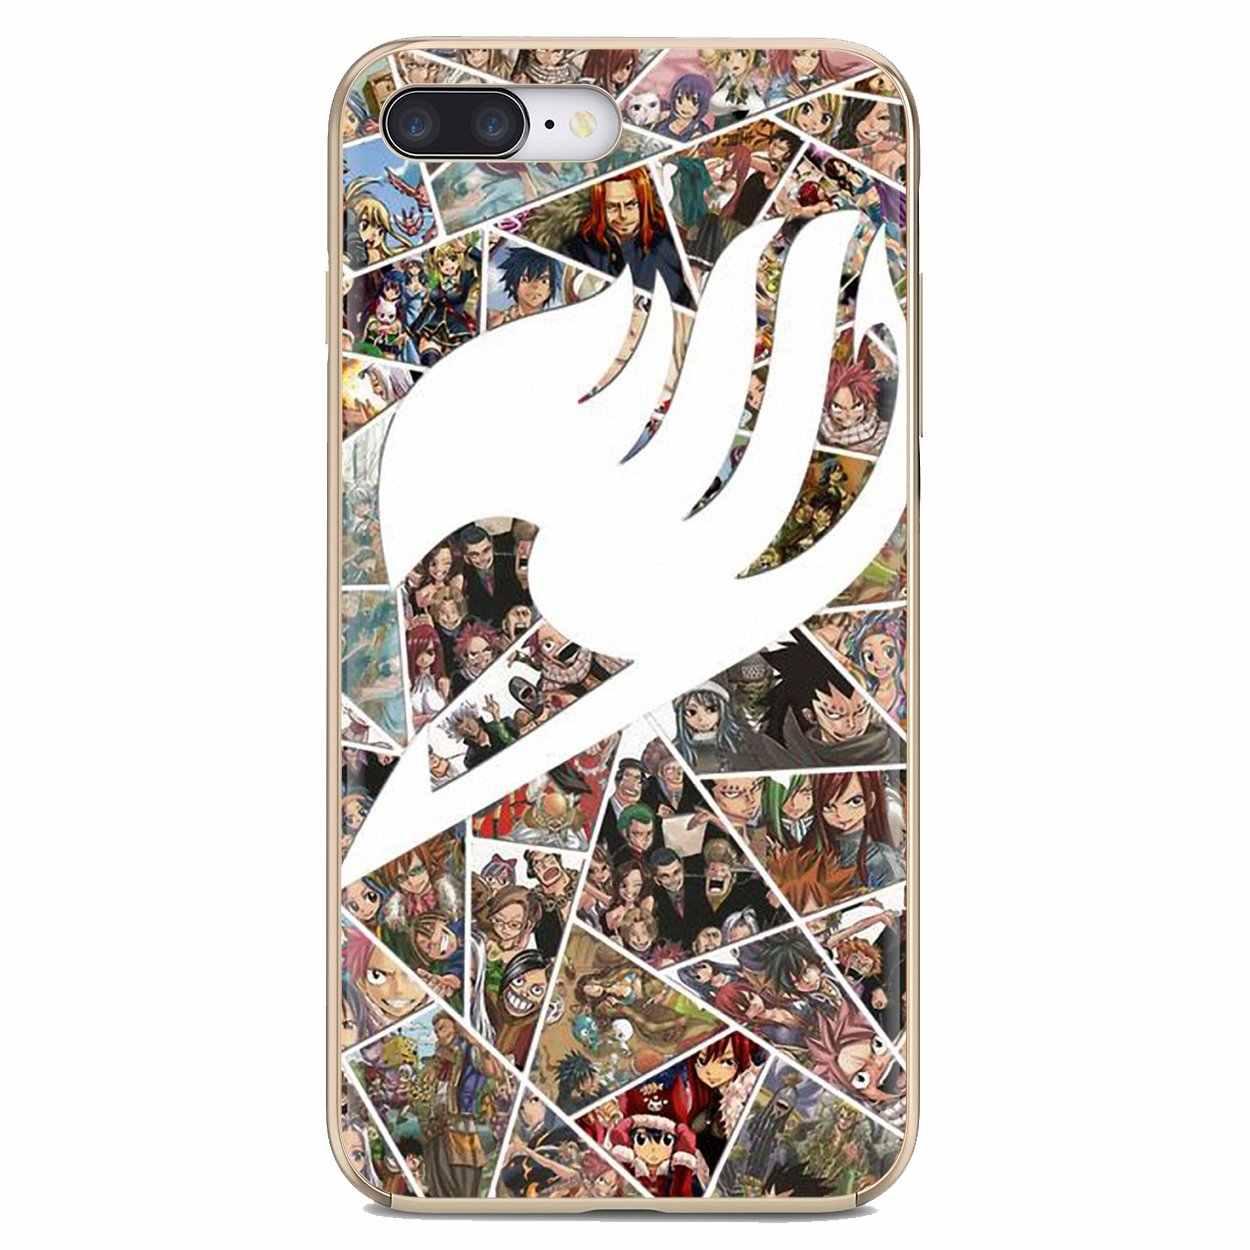 For BQ BQS S 5059 5035 6040L For HTC U11 U12 Plus For LG K10 K8 K7 K4 2017 Japan Rare Fairy Tail Full family Silicone Skin Cover